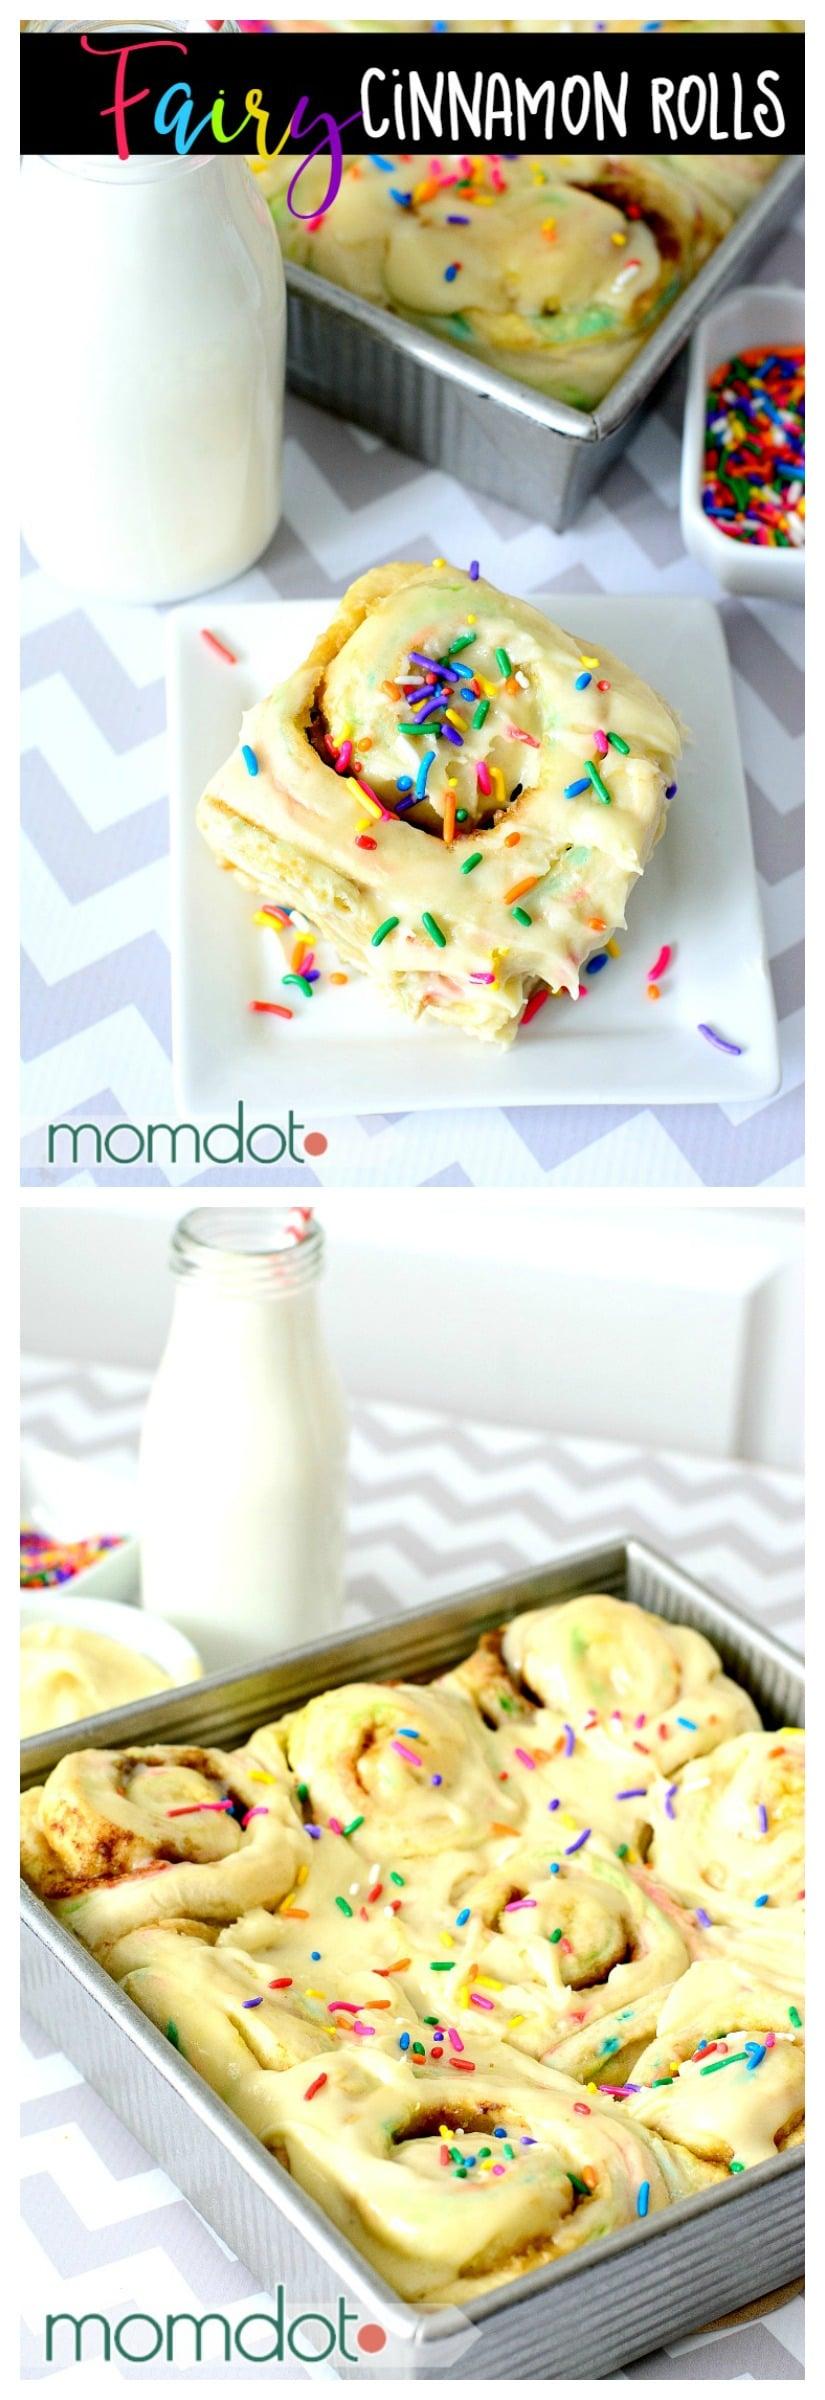 Fairy Cinnamon Roll Recipe: Funfetti Breakfast Roll Recipe, Birthday Breakfast with Cake Frosting!